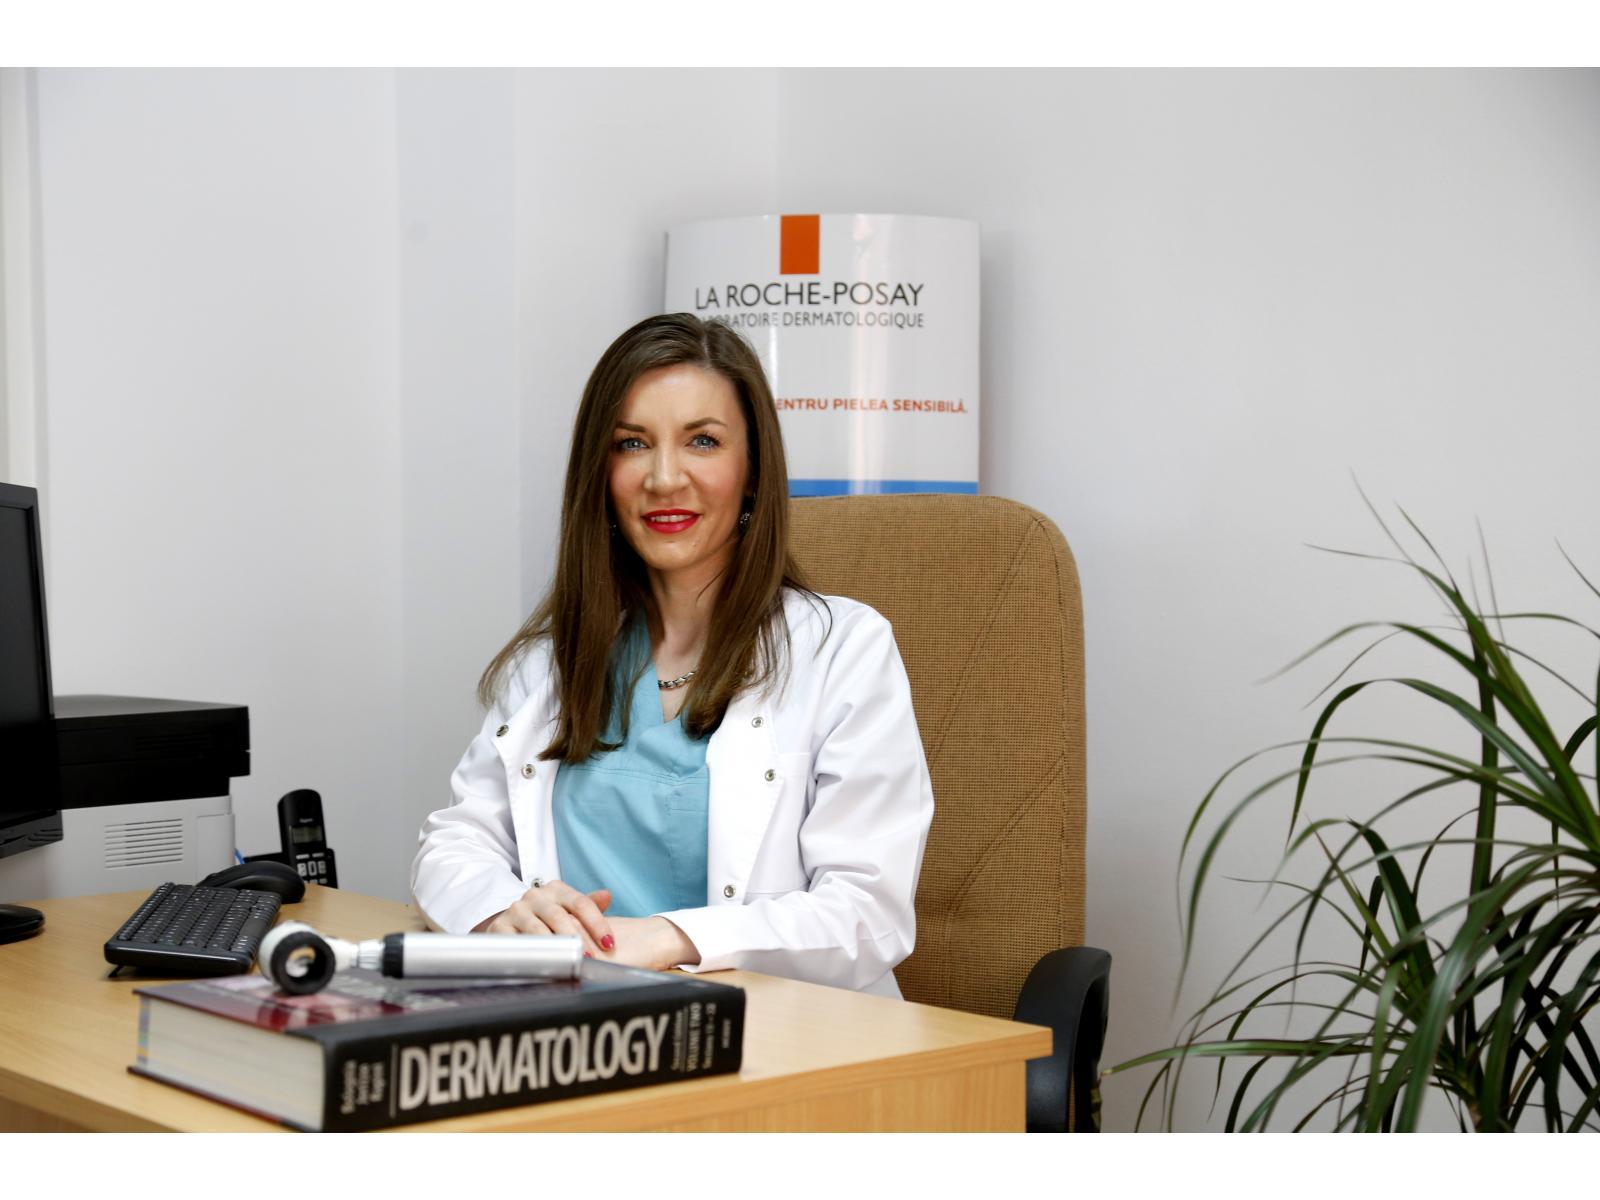 Dermisana-Clinica Dermato-estetica - _MG_5274.JPG